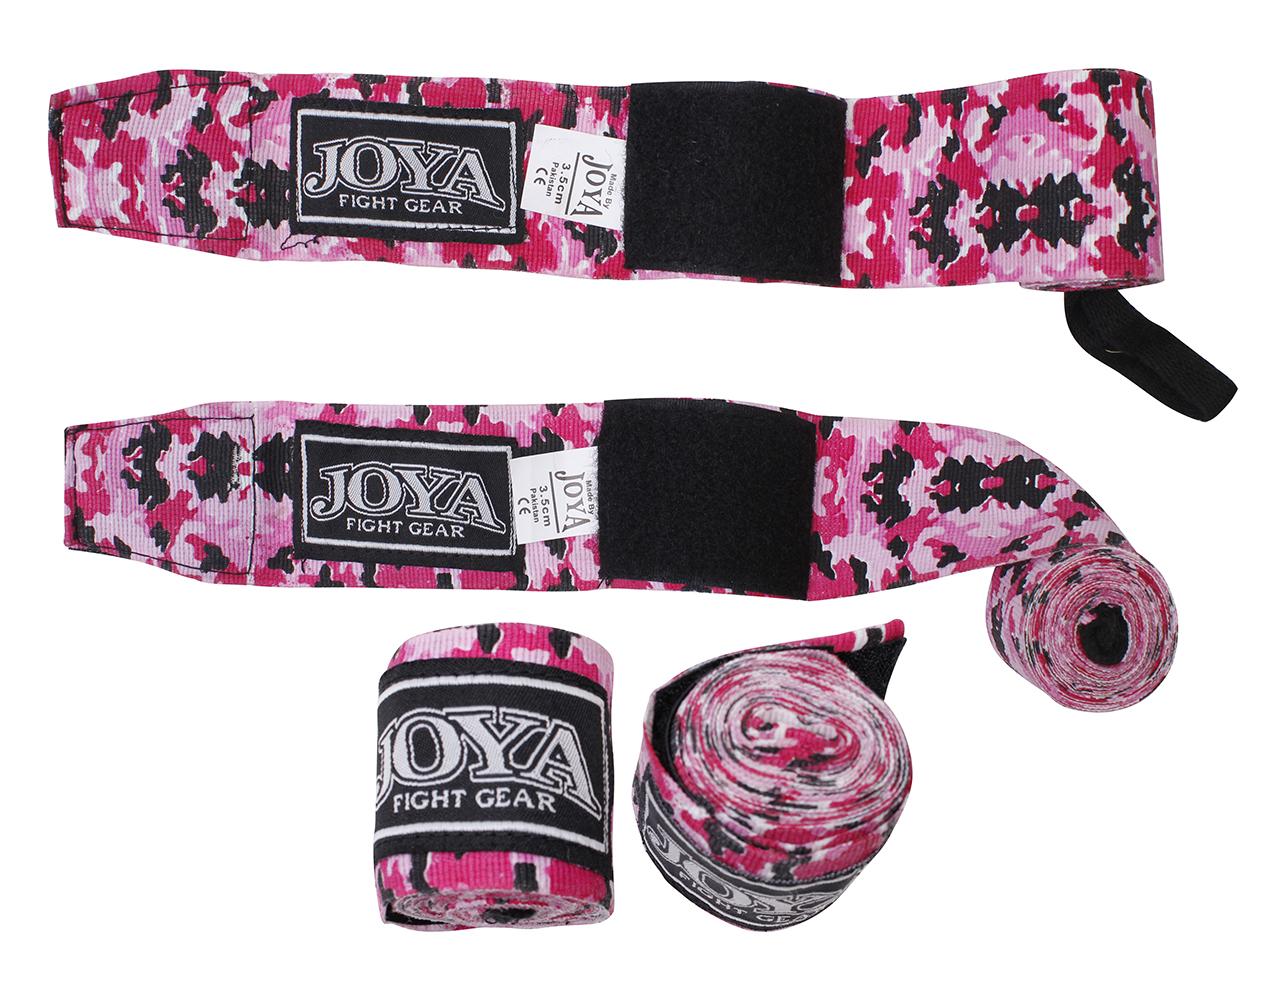 Joya Bandage Camouflage Roze Junior 2,8mtr – jokasport.nl